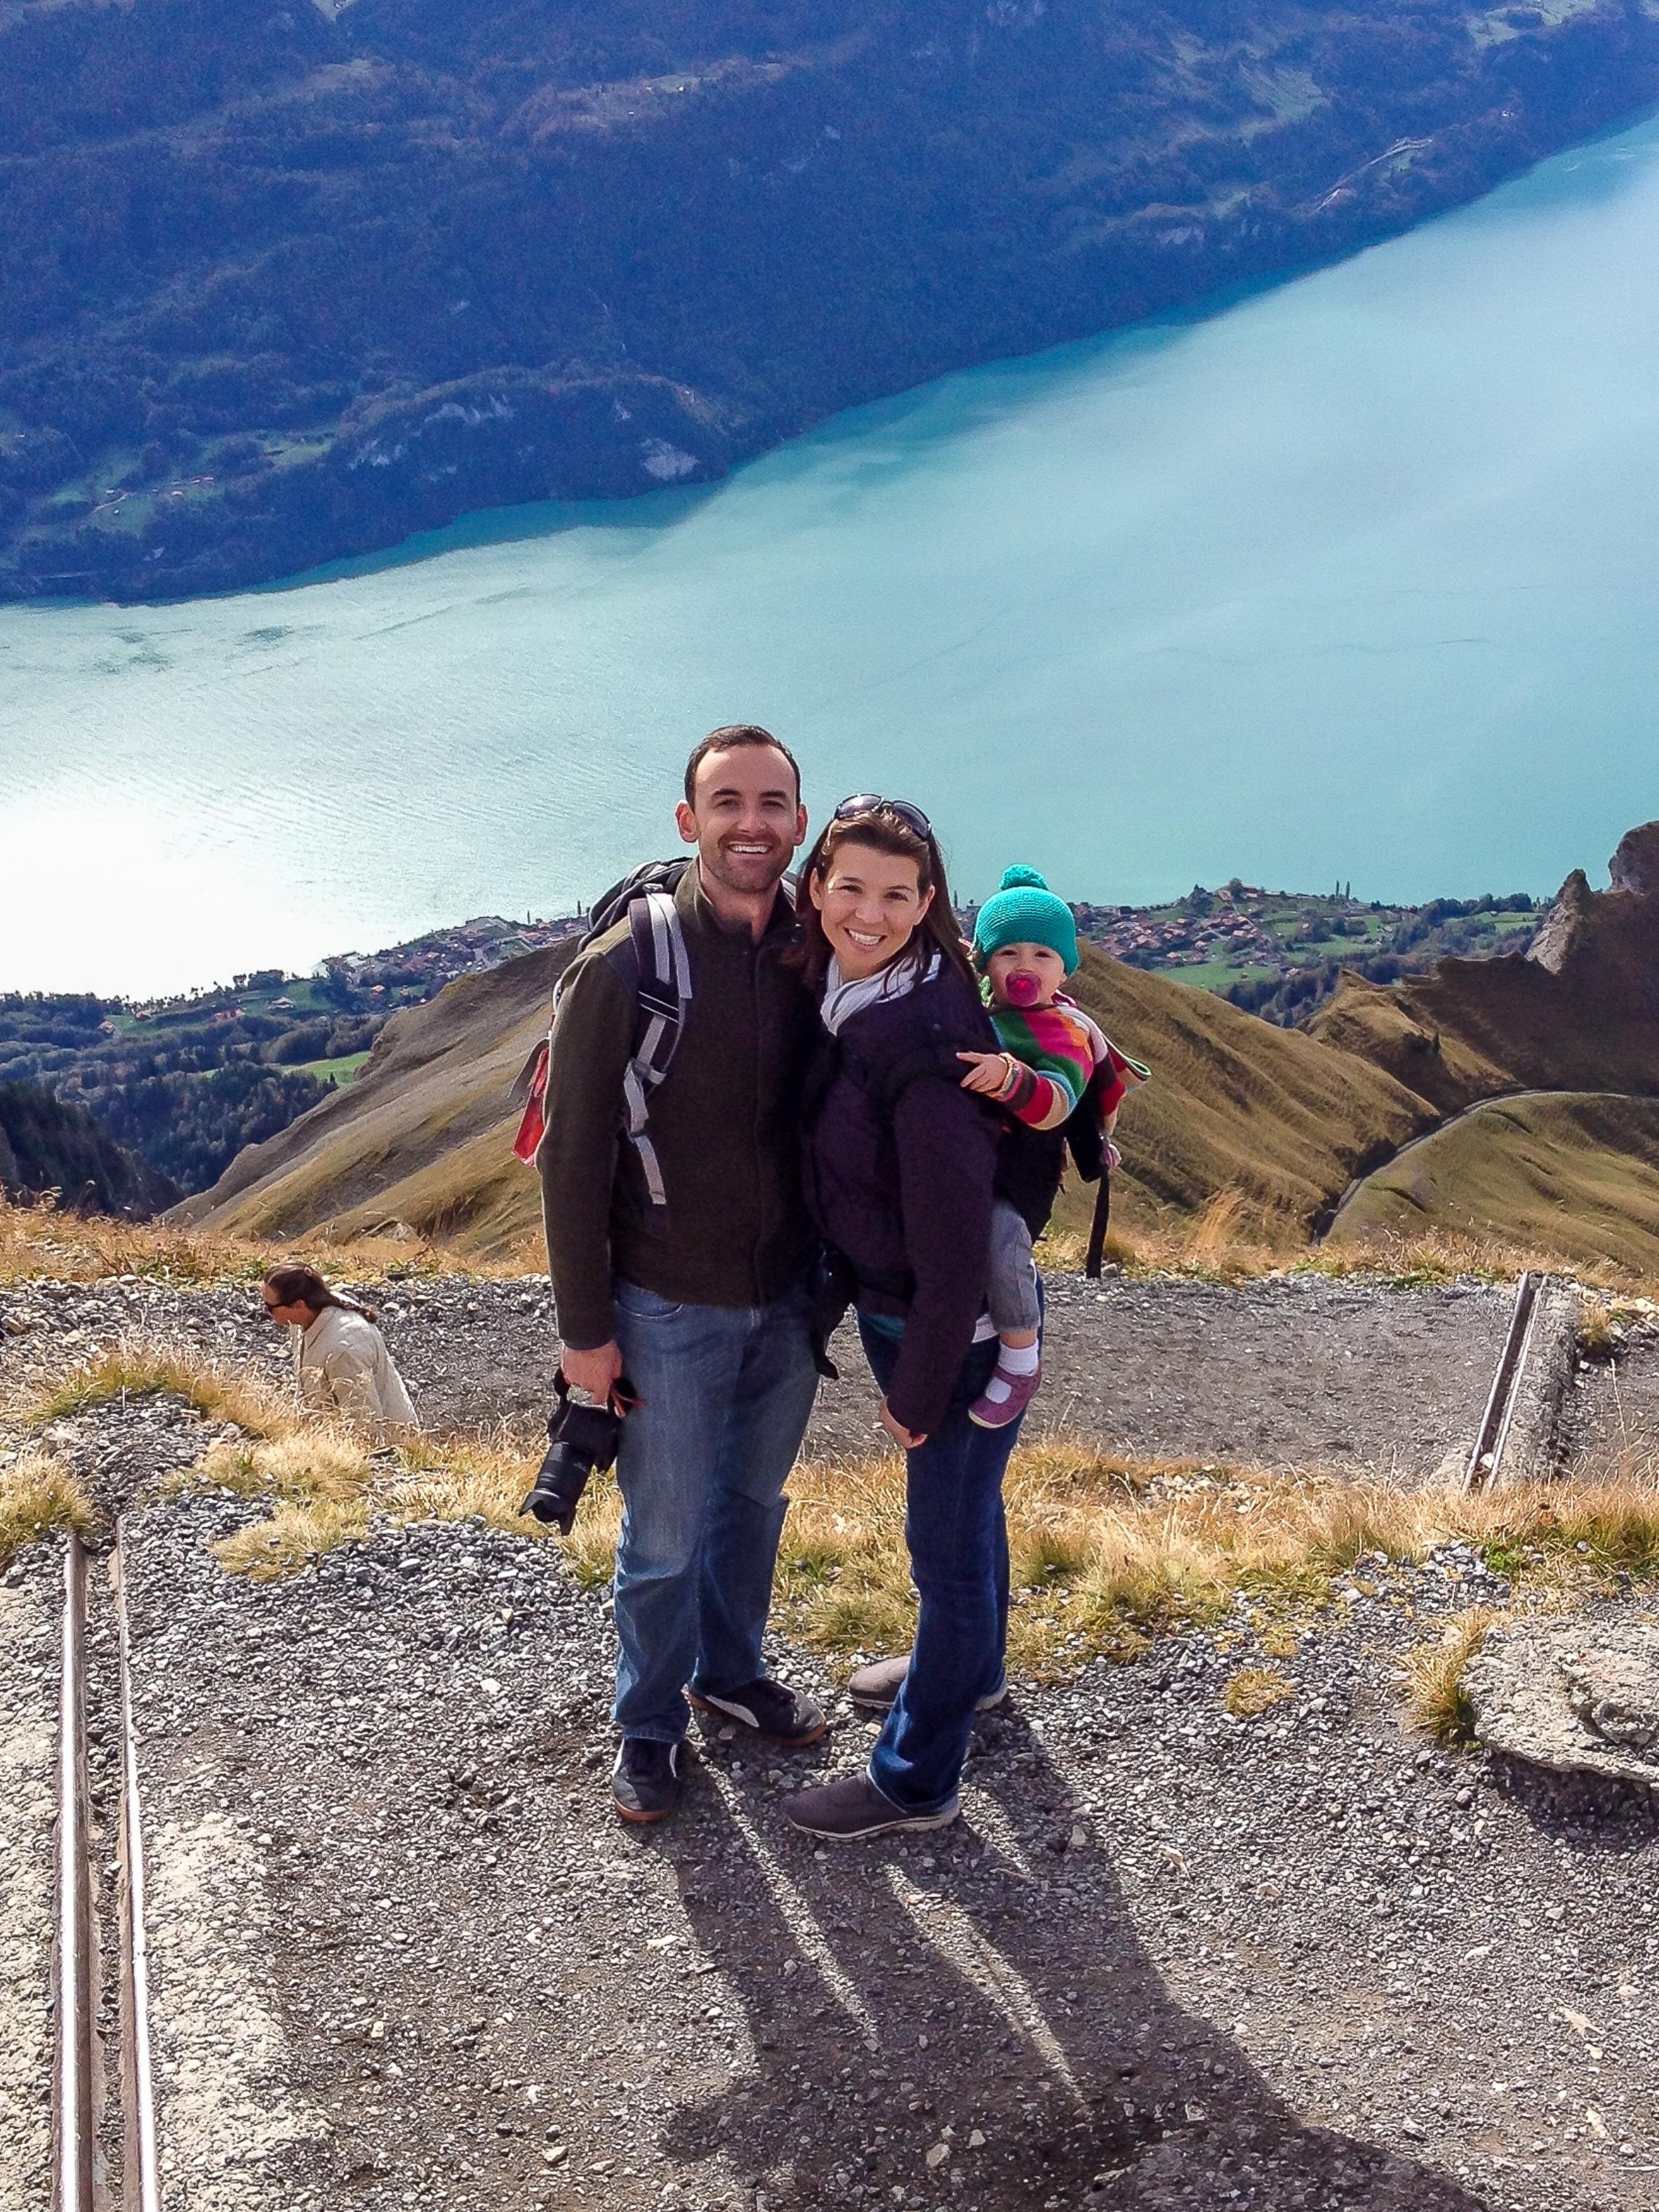 30-day-locals-family-travelers.jpg